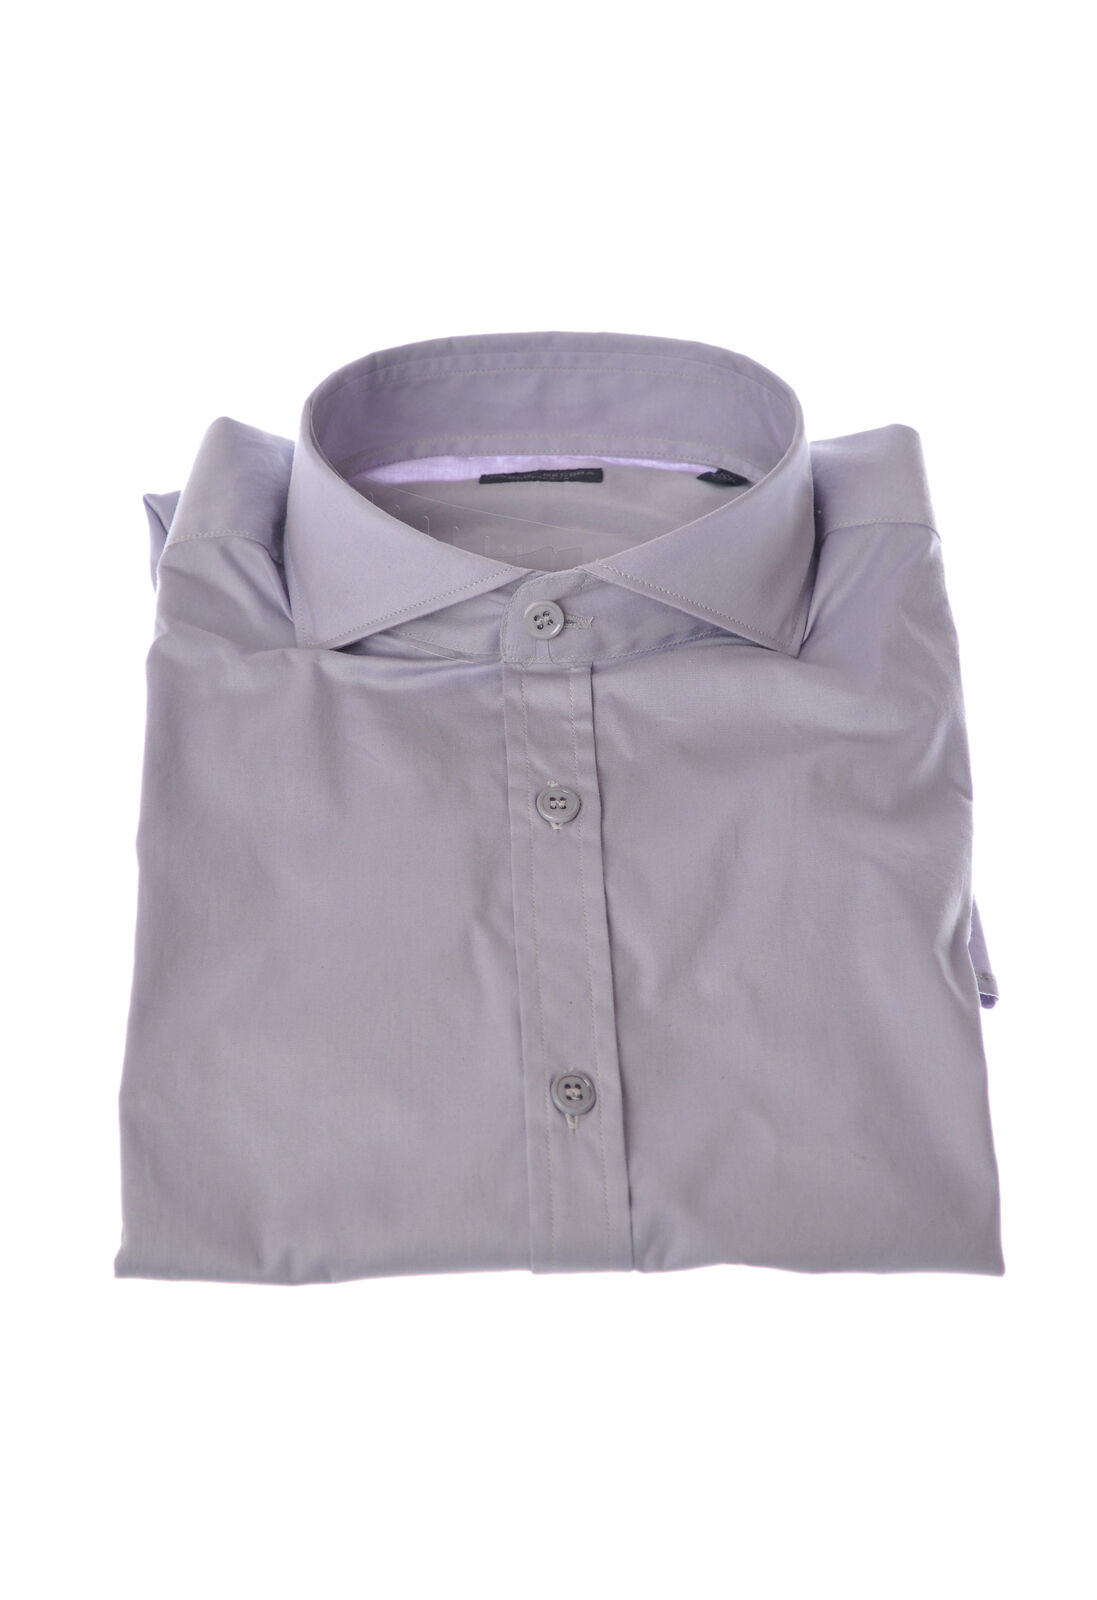 Paolo Pecora - Shirts-Shirt - Man - Grau - 3000706C183723